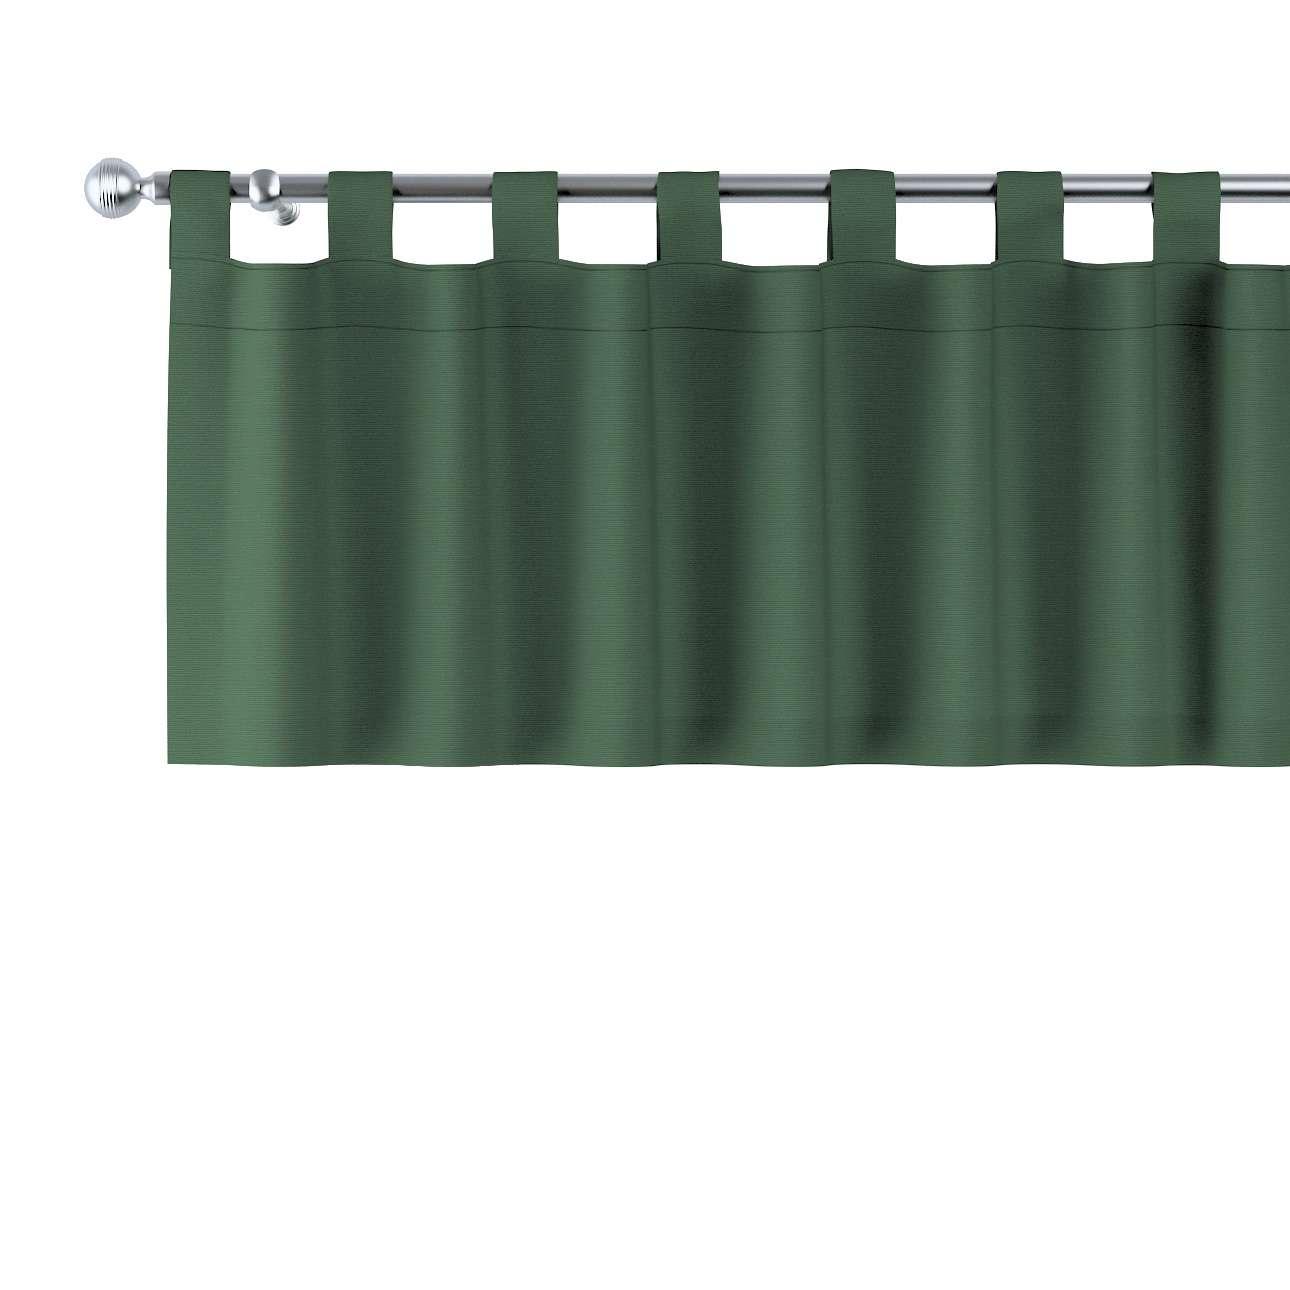 Gardinkappe med stropper 130x40cm fra kollektionen Cotton Panama, Stof: 702-06